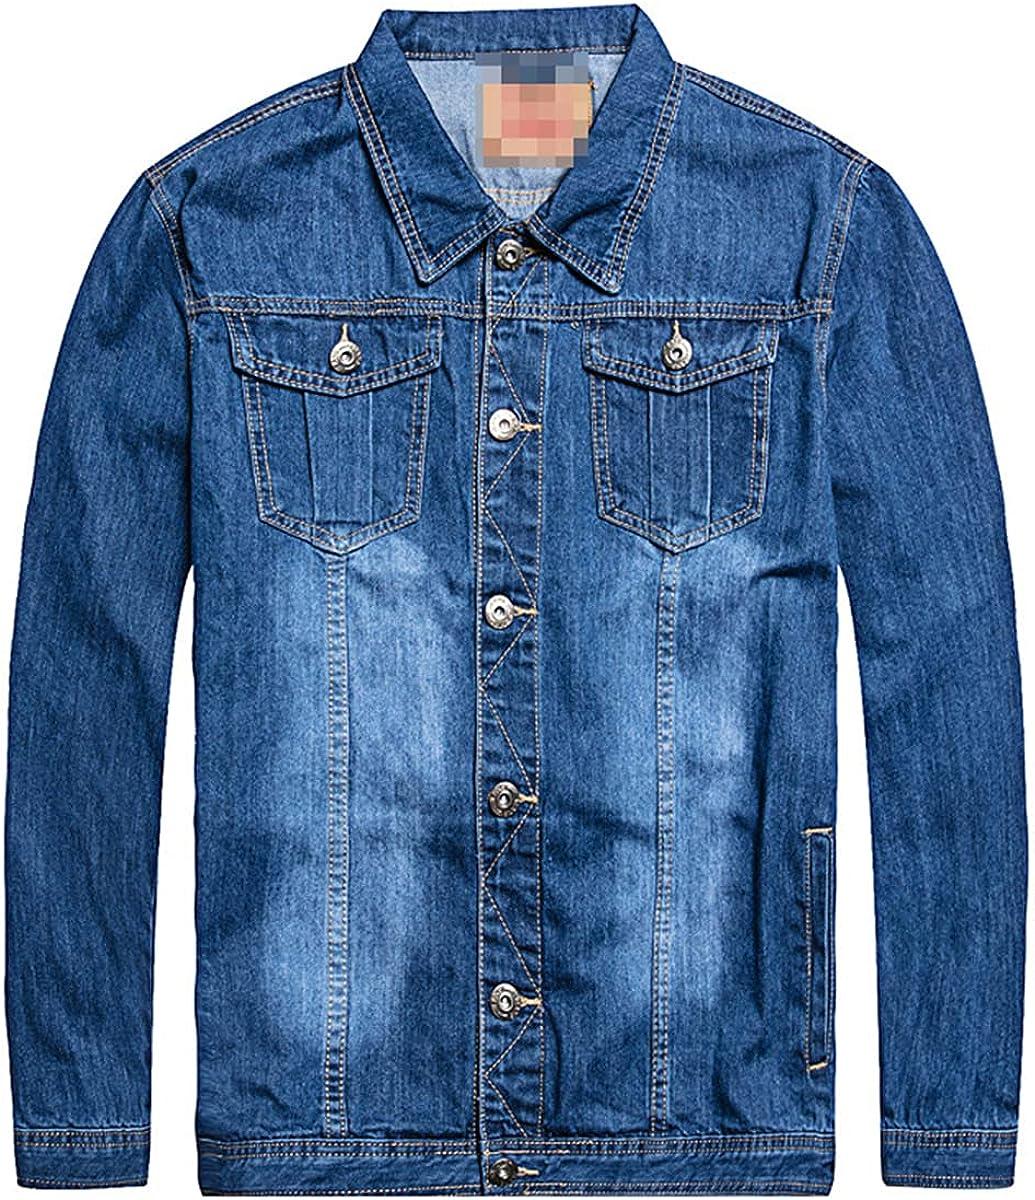 Men's Oversized Fashion Design Spring Plus Size Clothing Casual Jacket Men's Denim Jacket